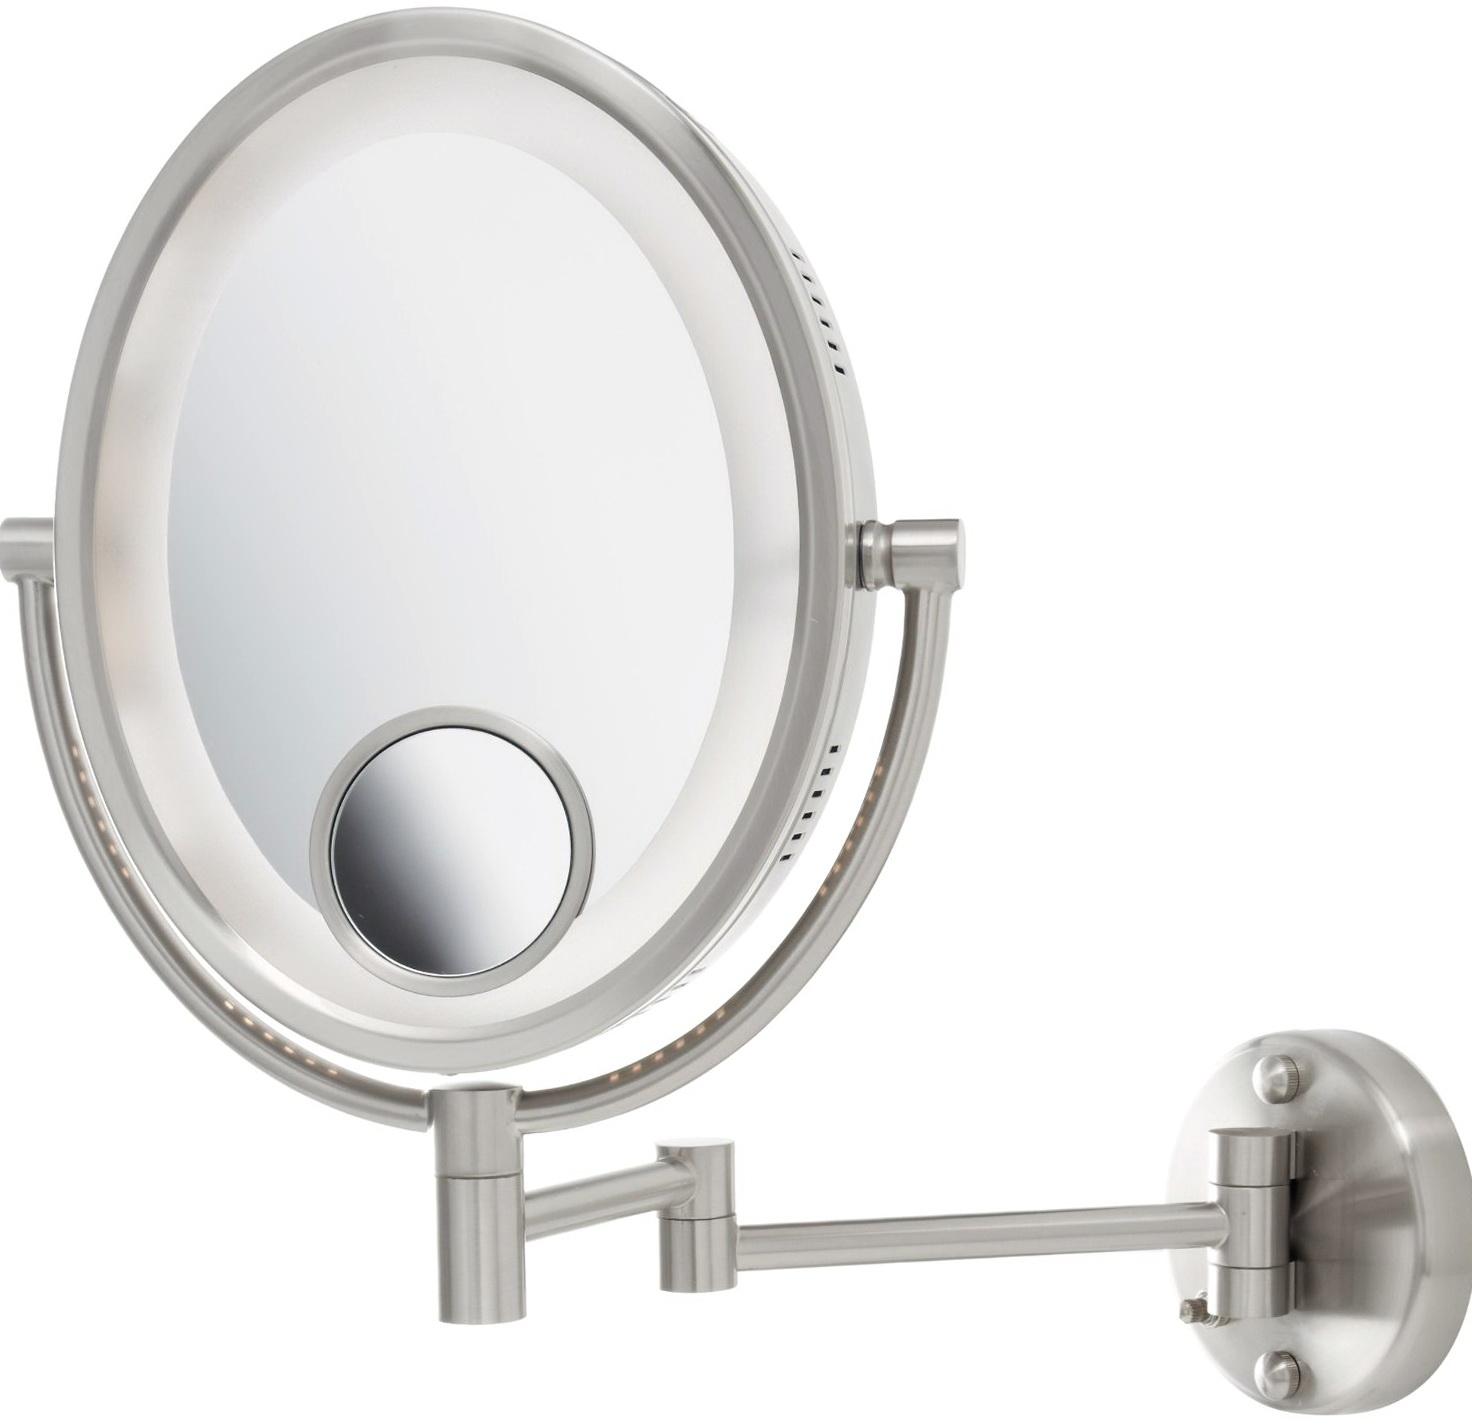 Conair Makeup Mirror Model Be103